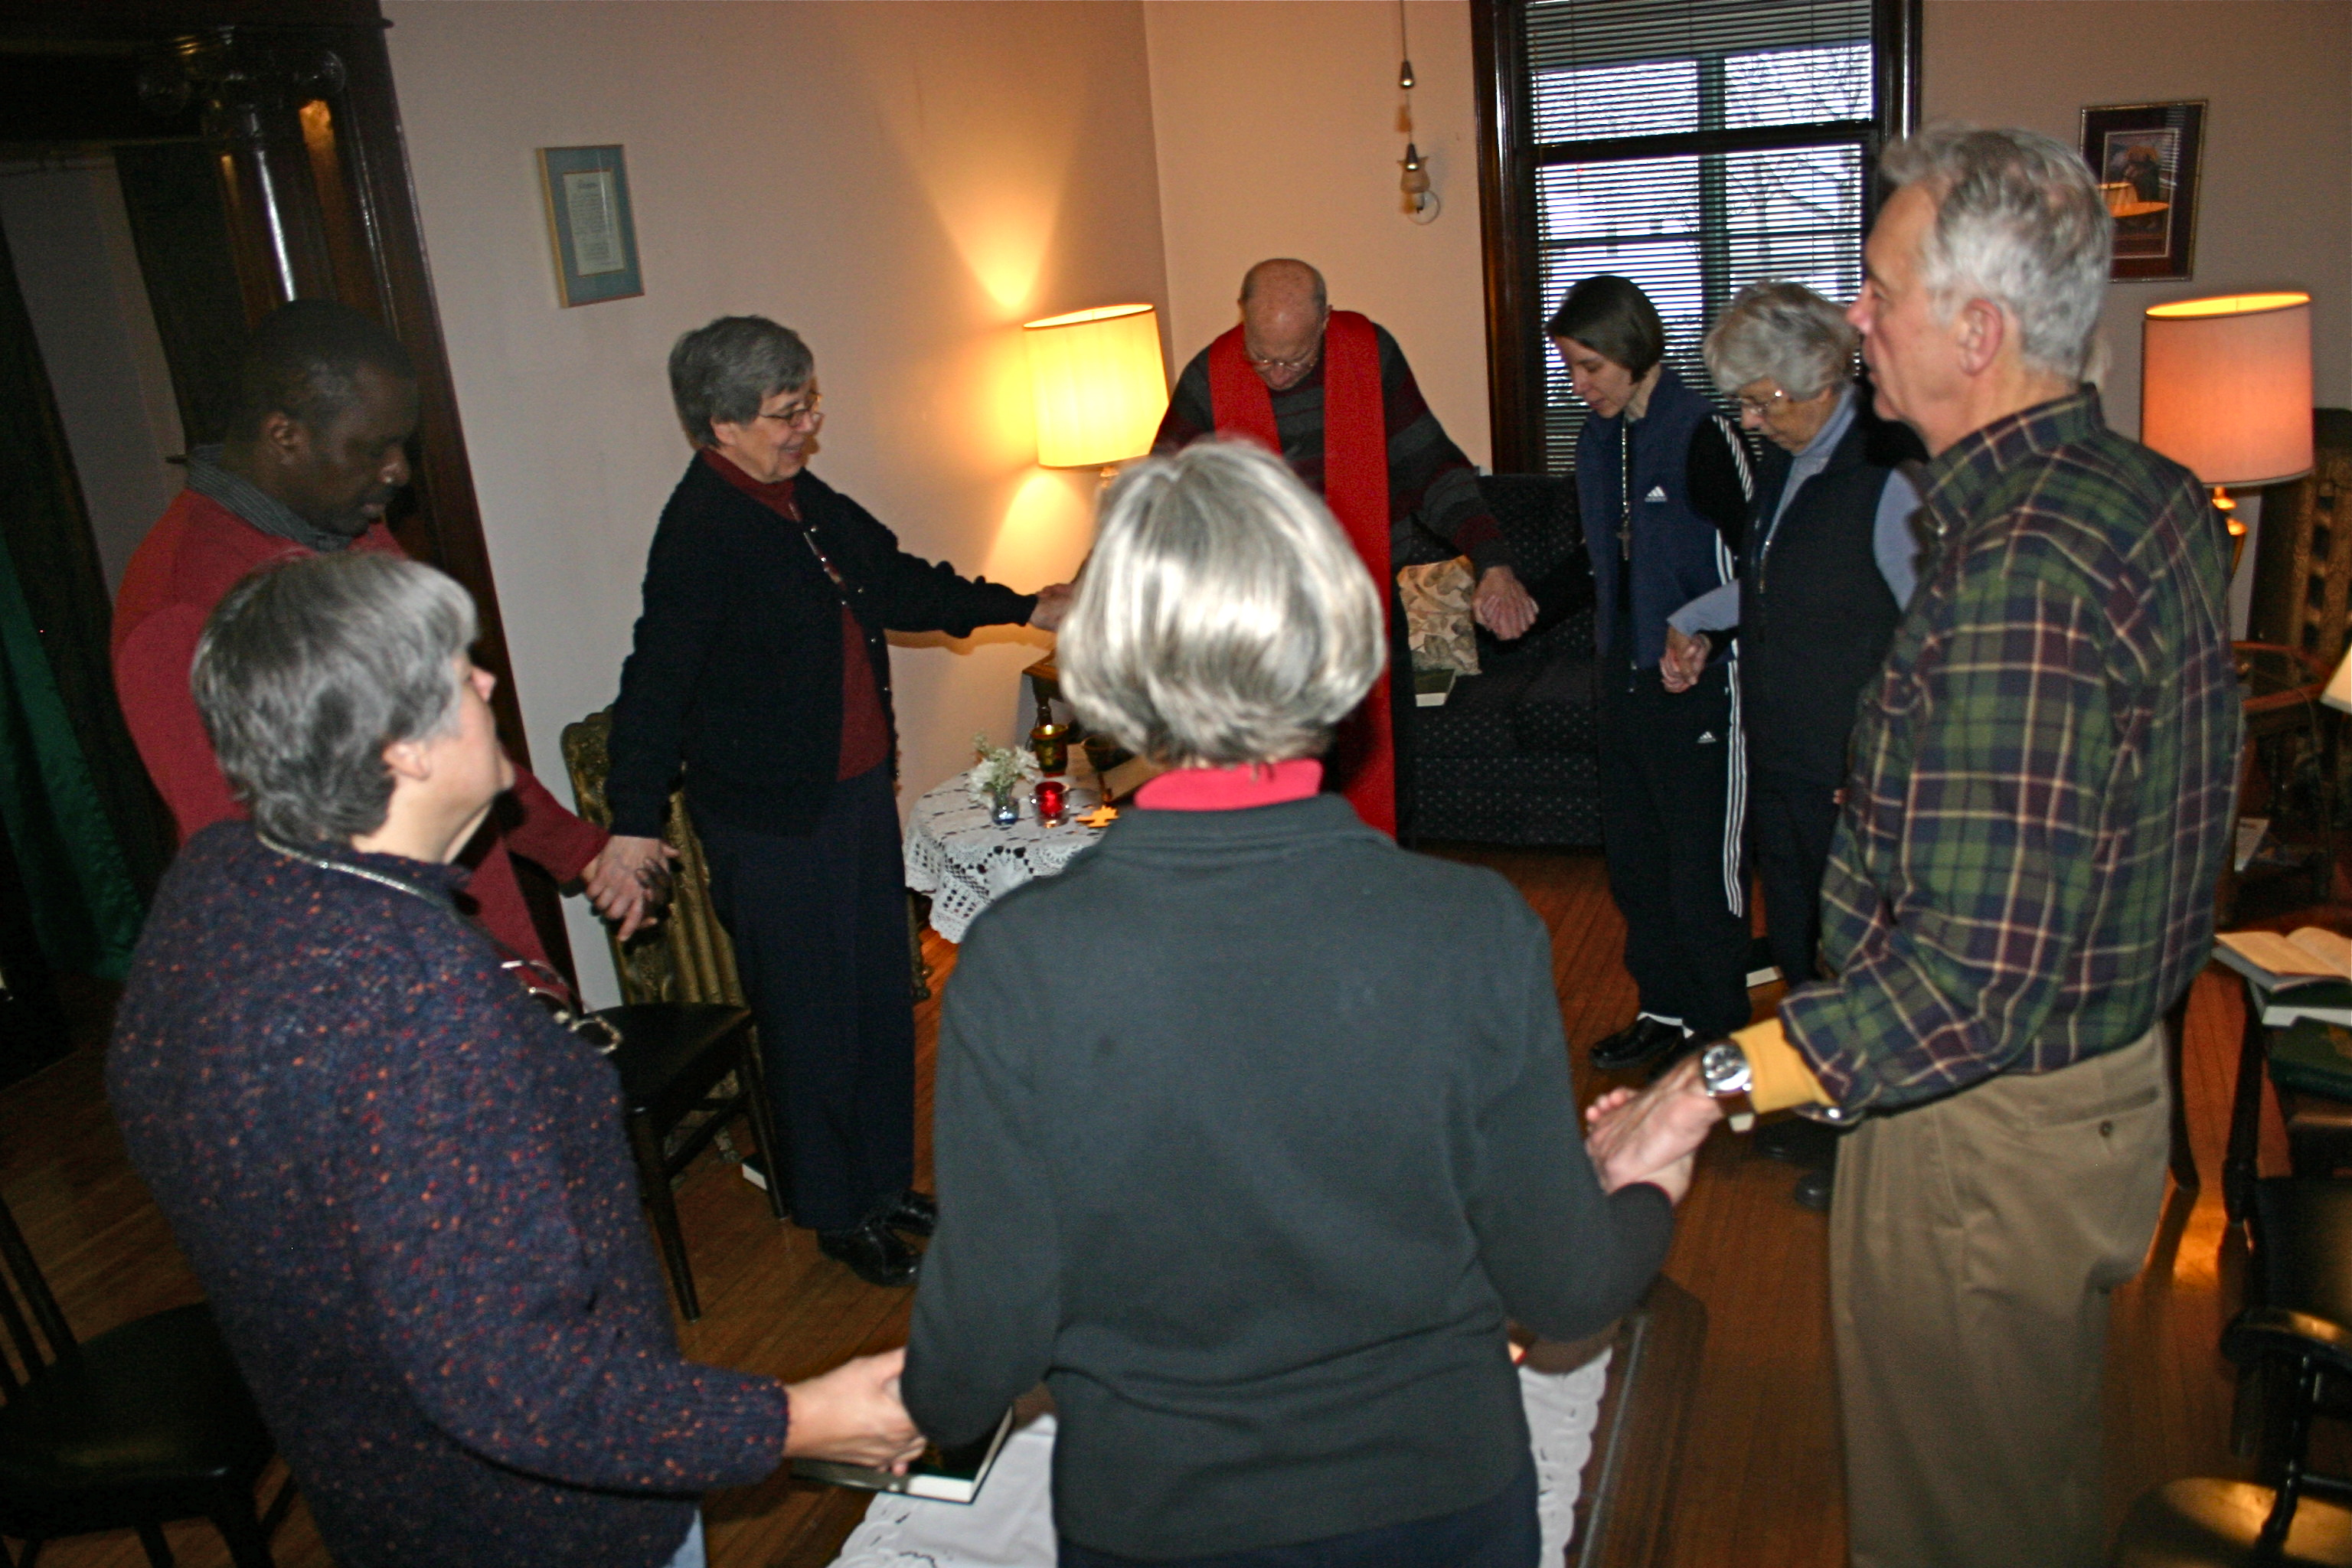 Mass at the Monastery | Visitation Monastery of Minneapolis